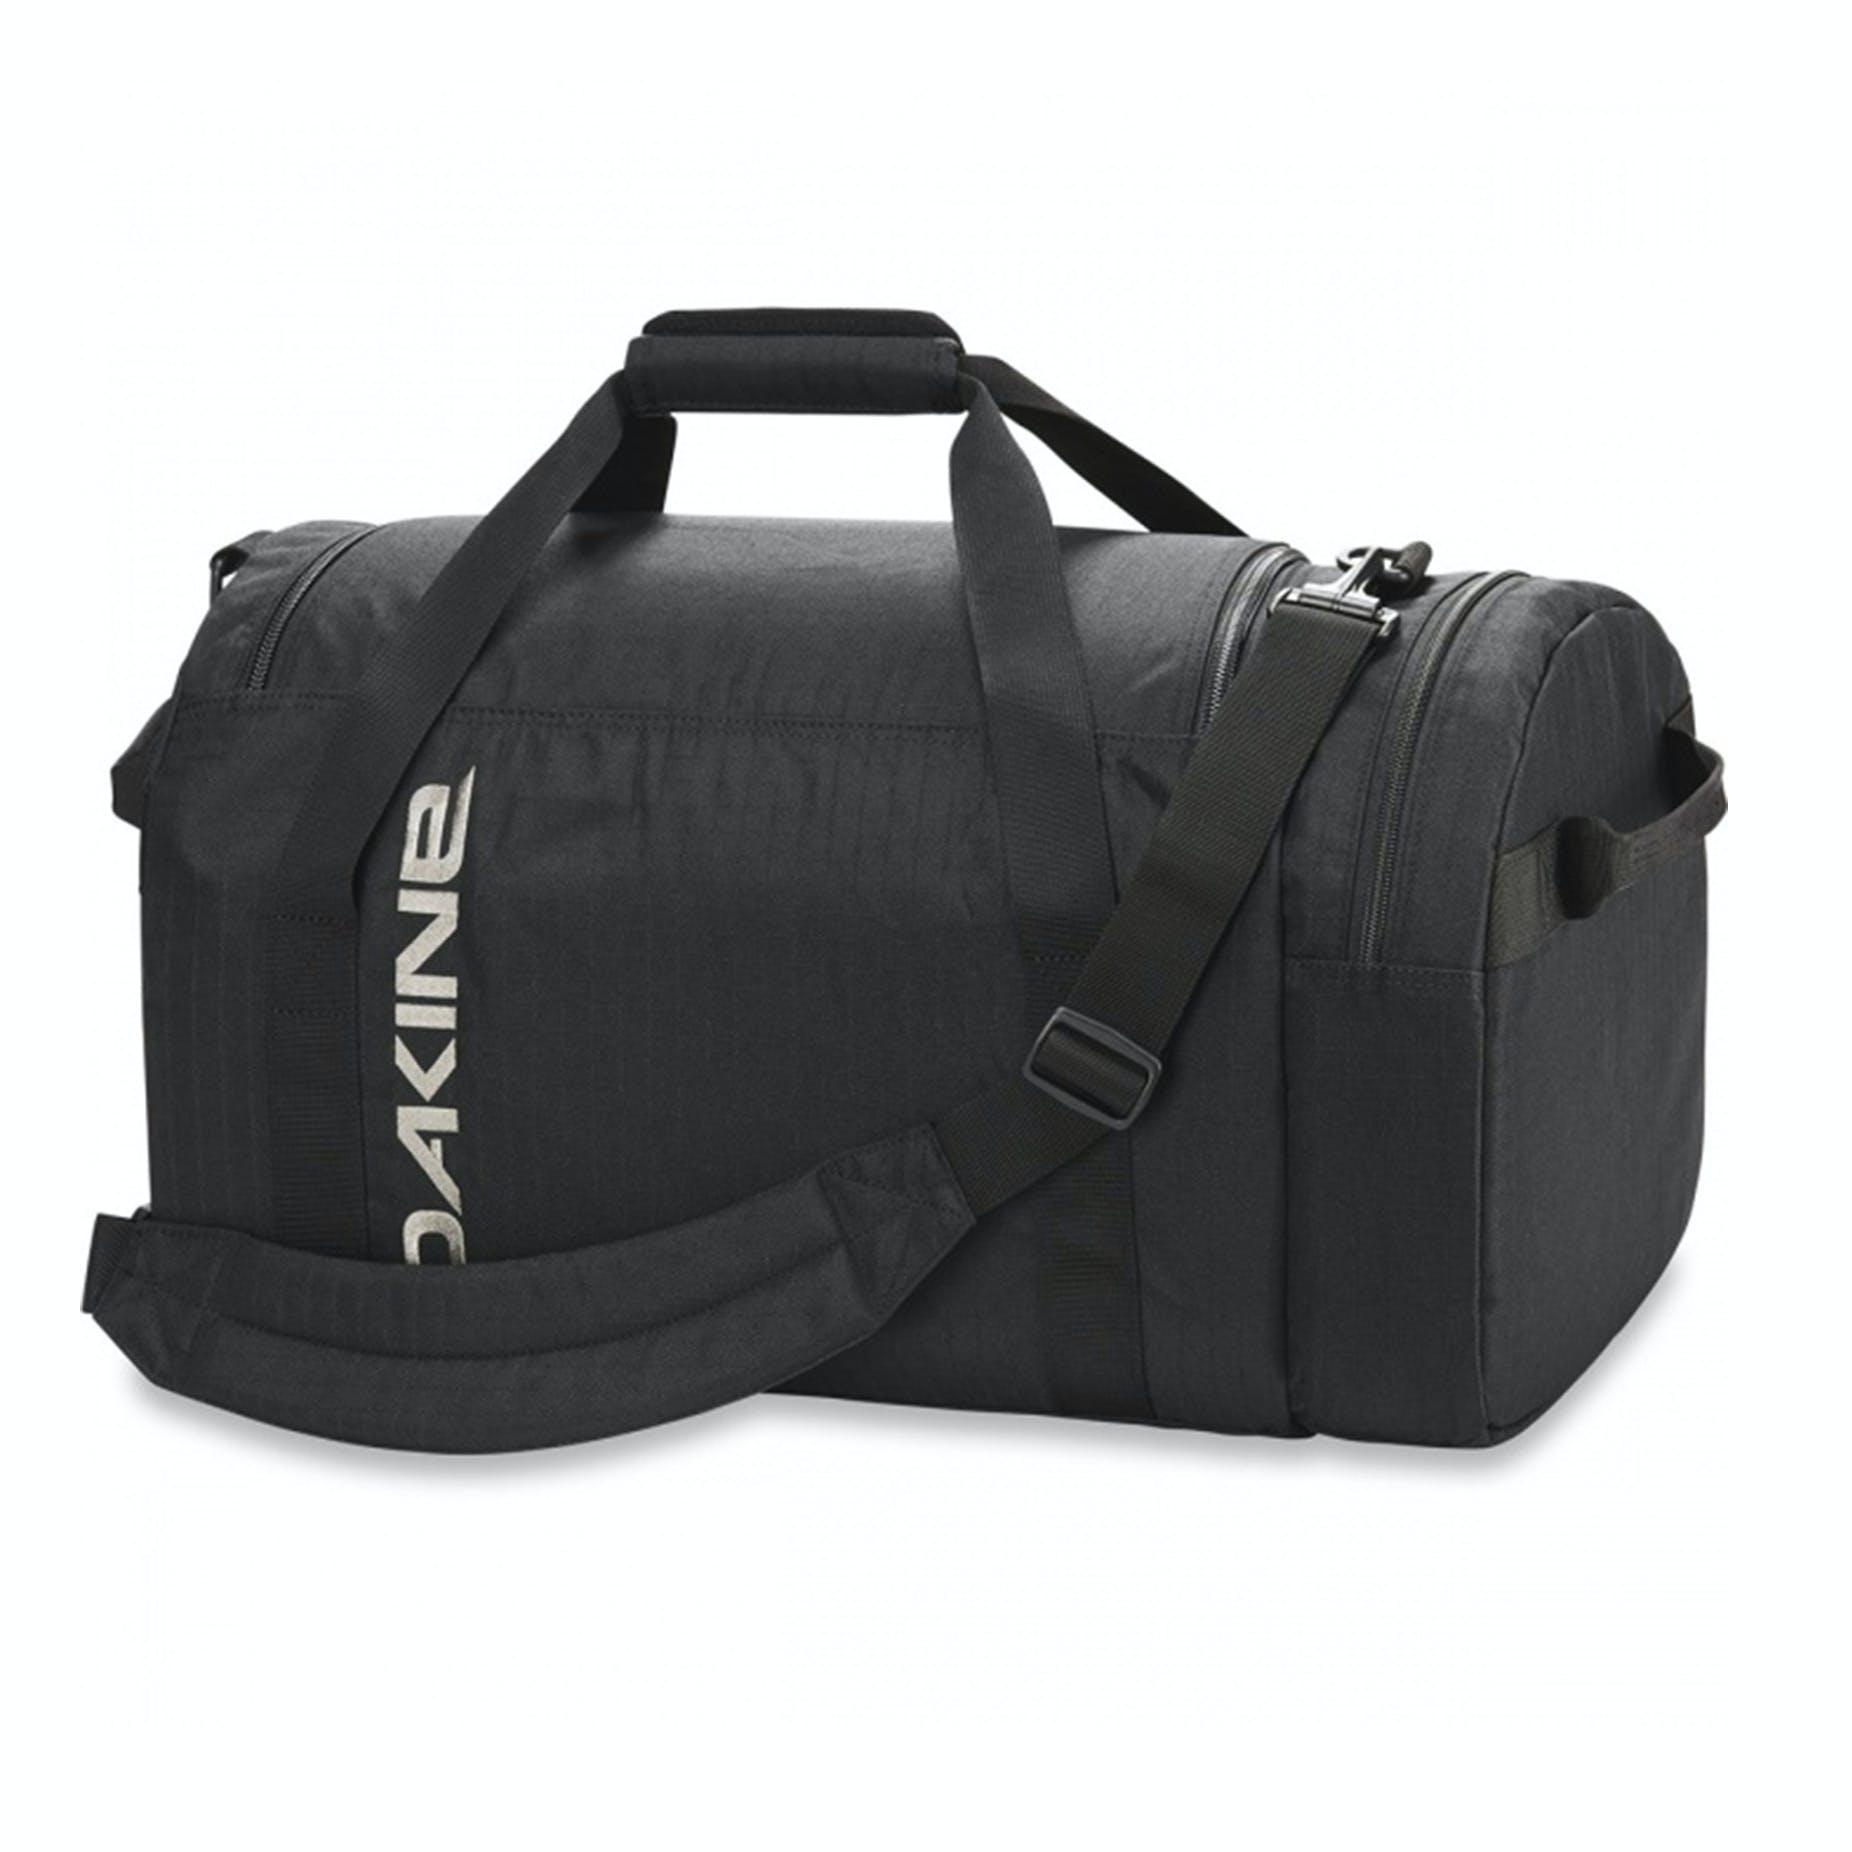 7ef527040309 Dakine EQ Duffel 50L Bag - Black | BOARDWORLD Store